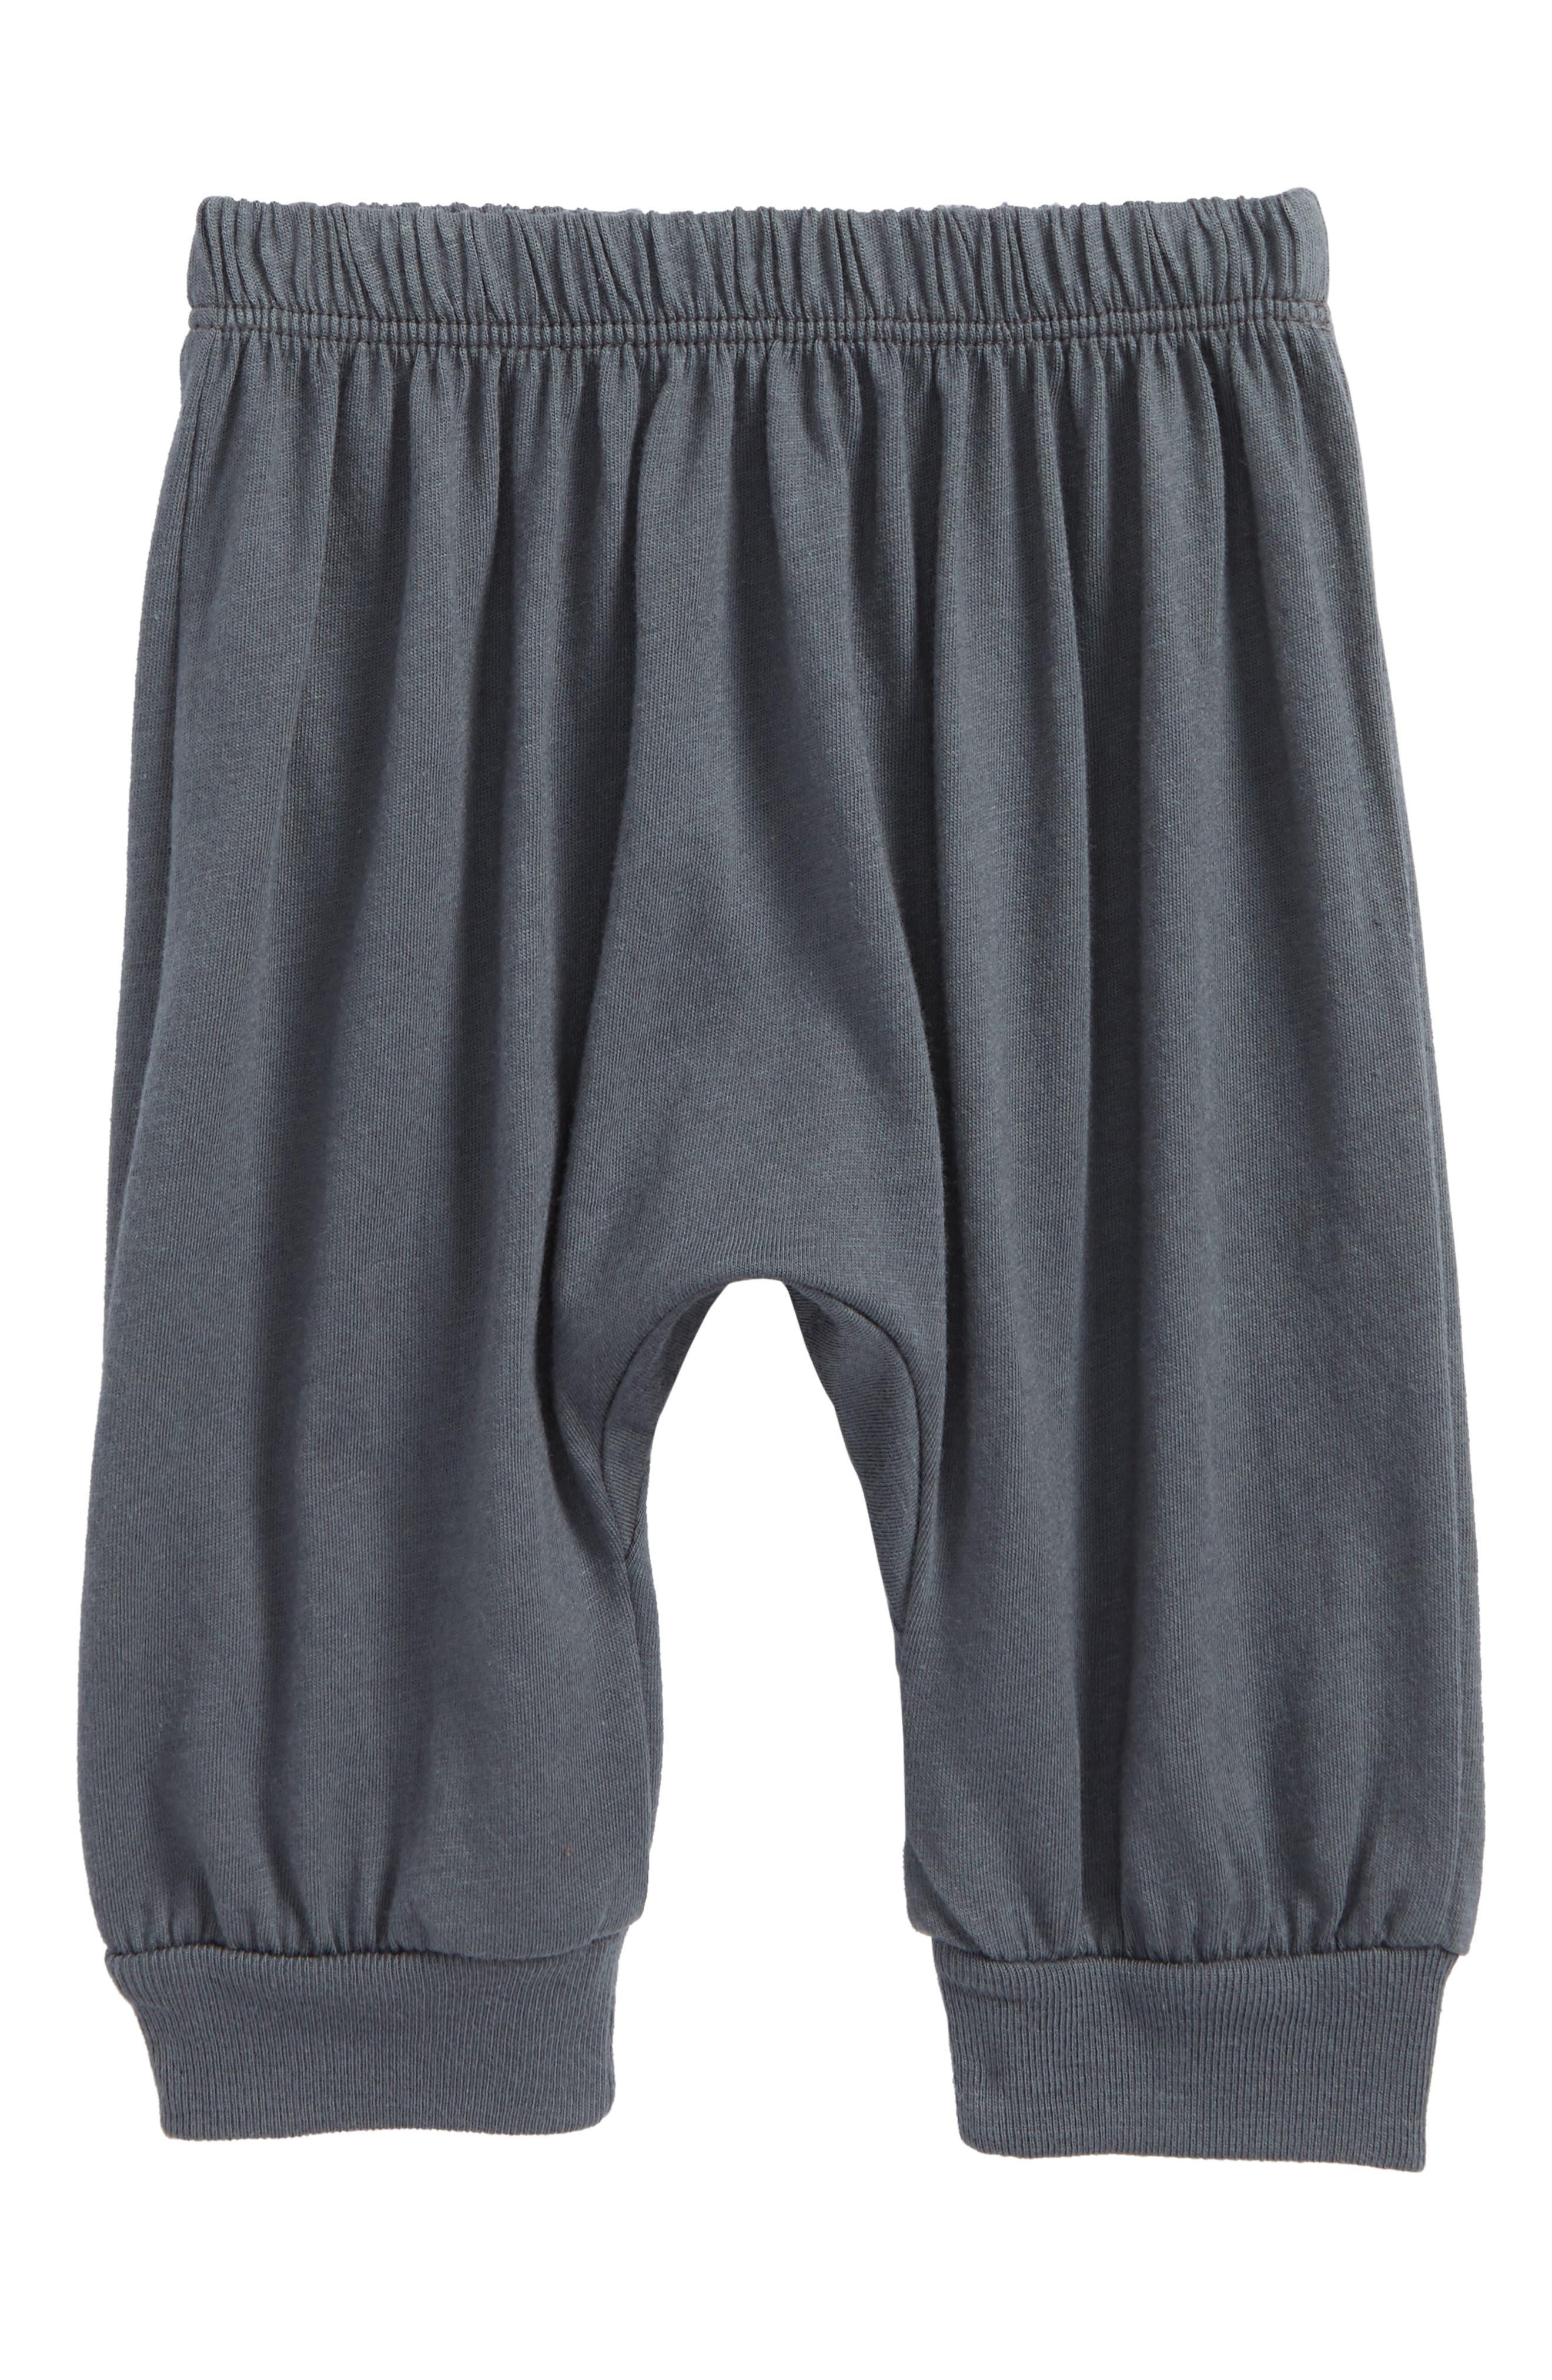 Peek Little Peanut Happy Pants,                         Main,                         color, Slate